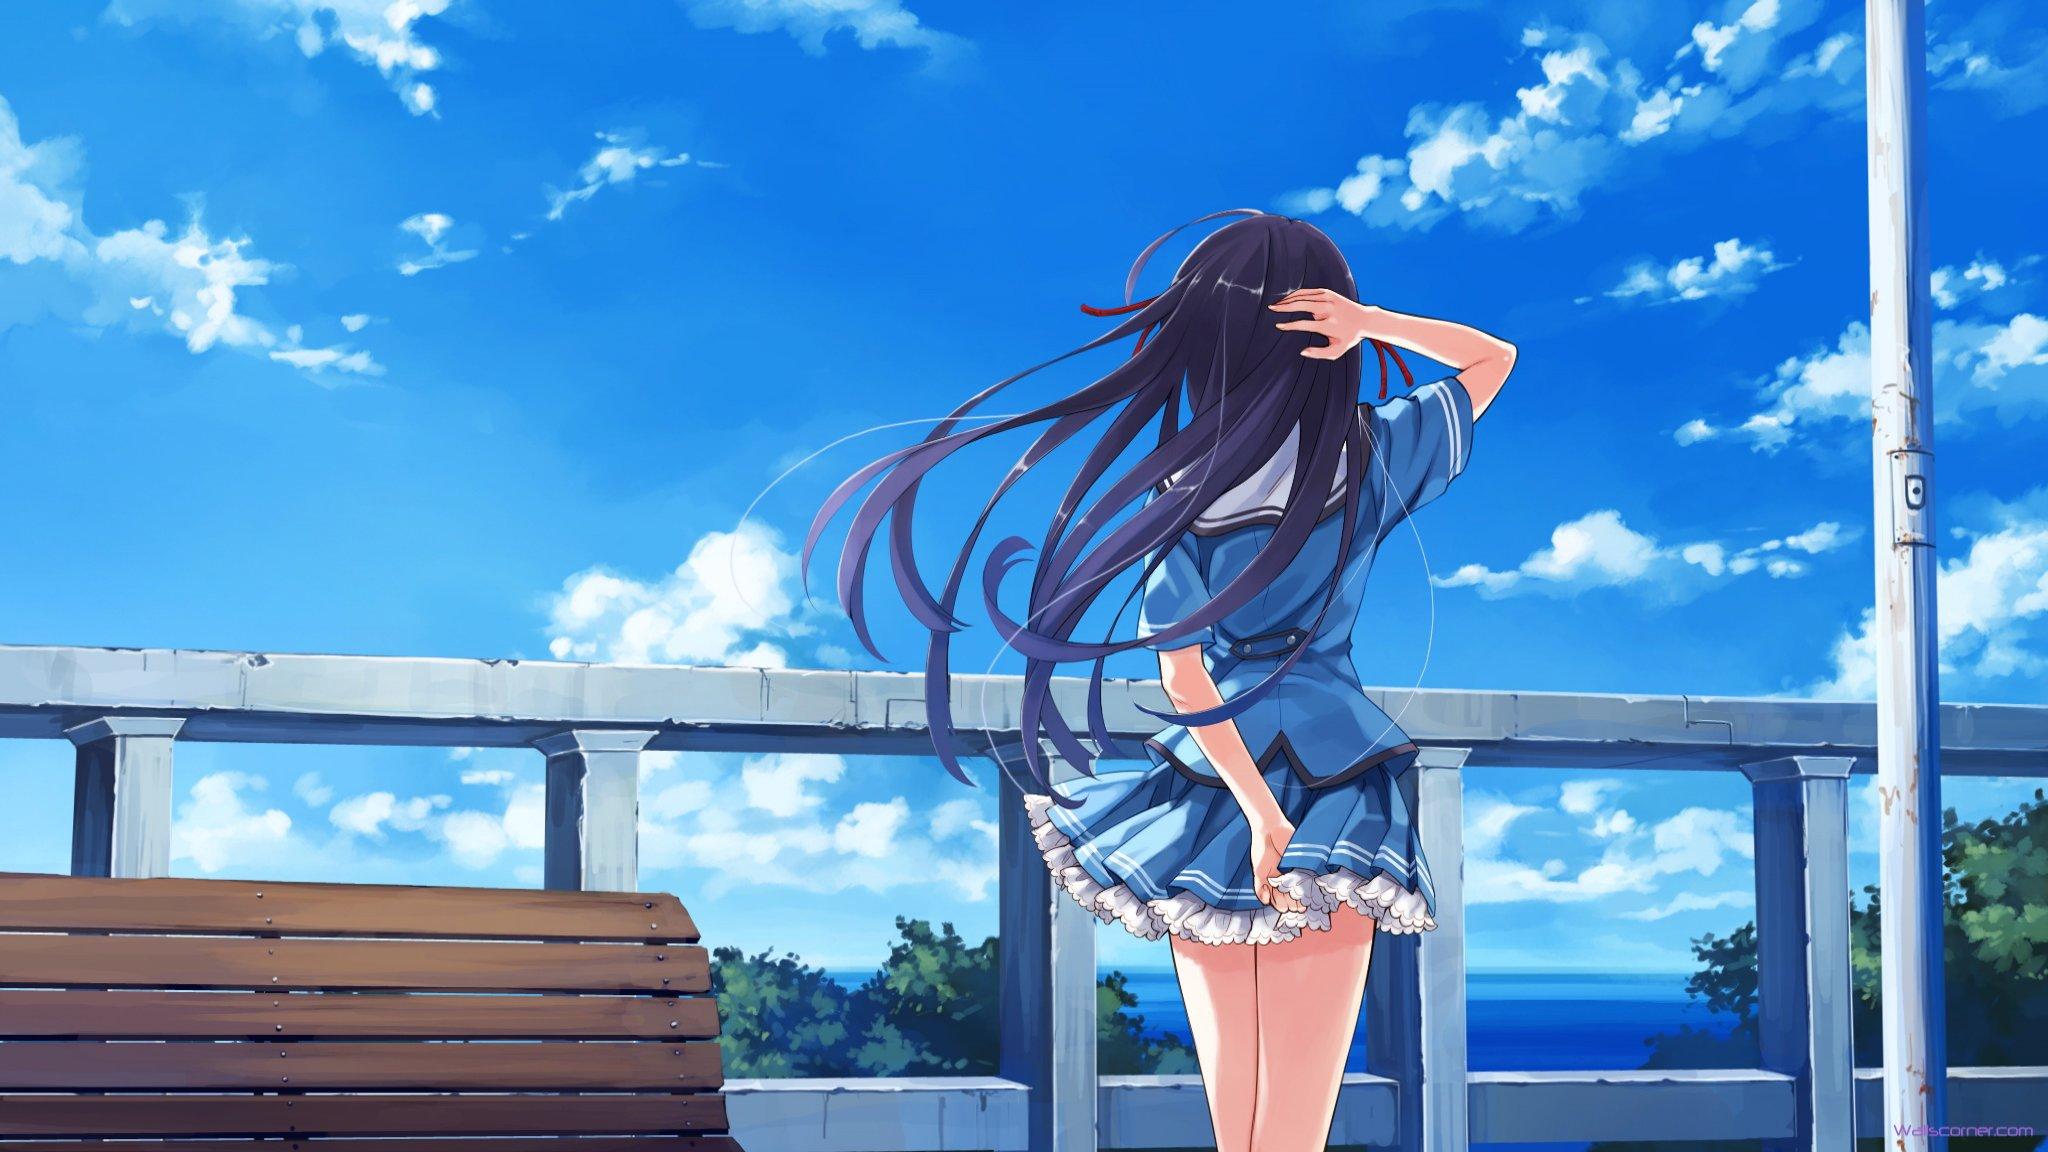 Anime Girl With Headphones And Black Hair